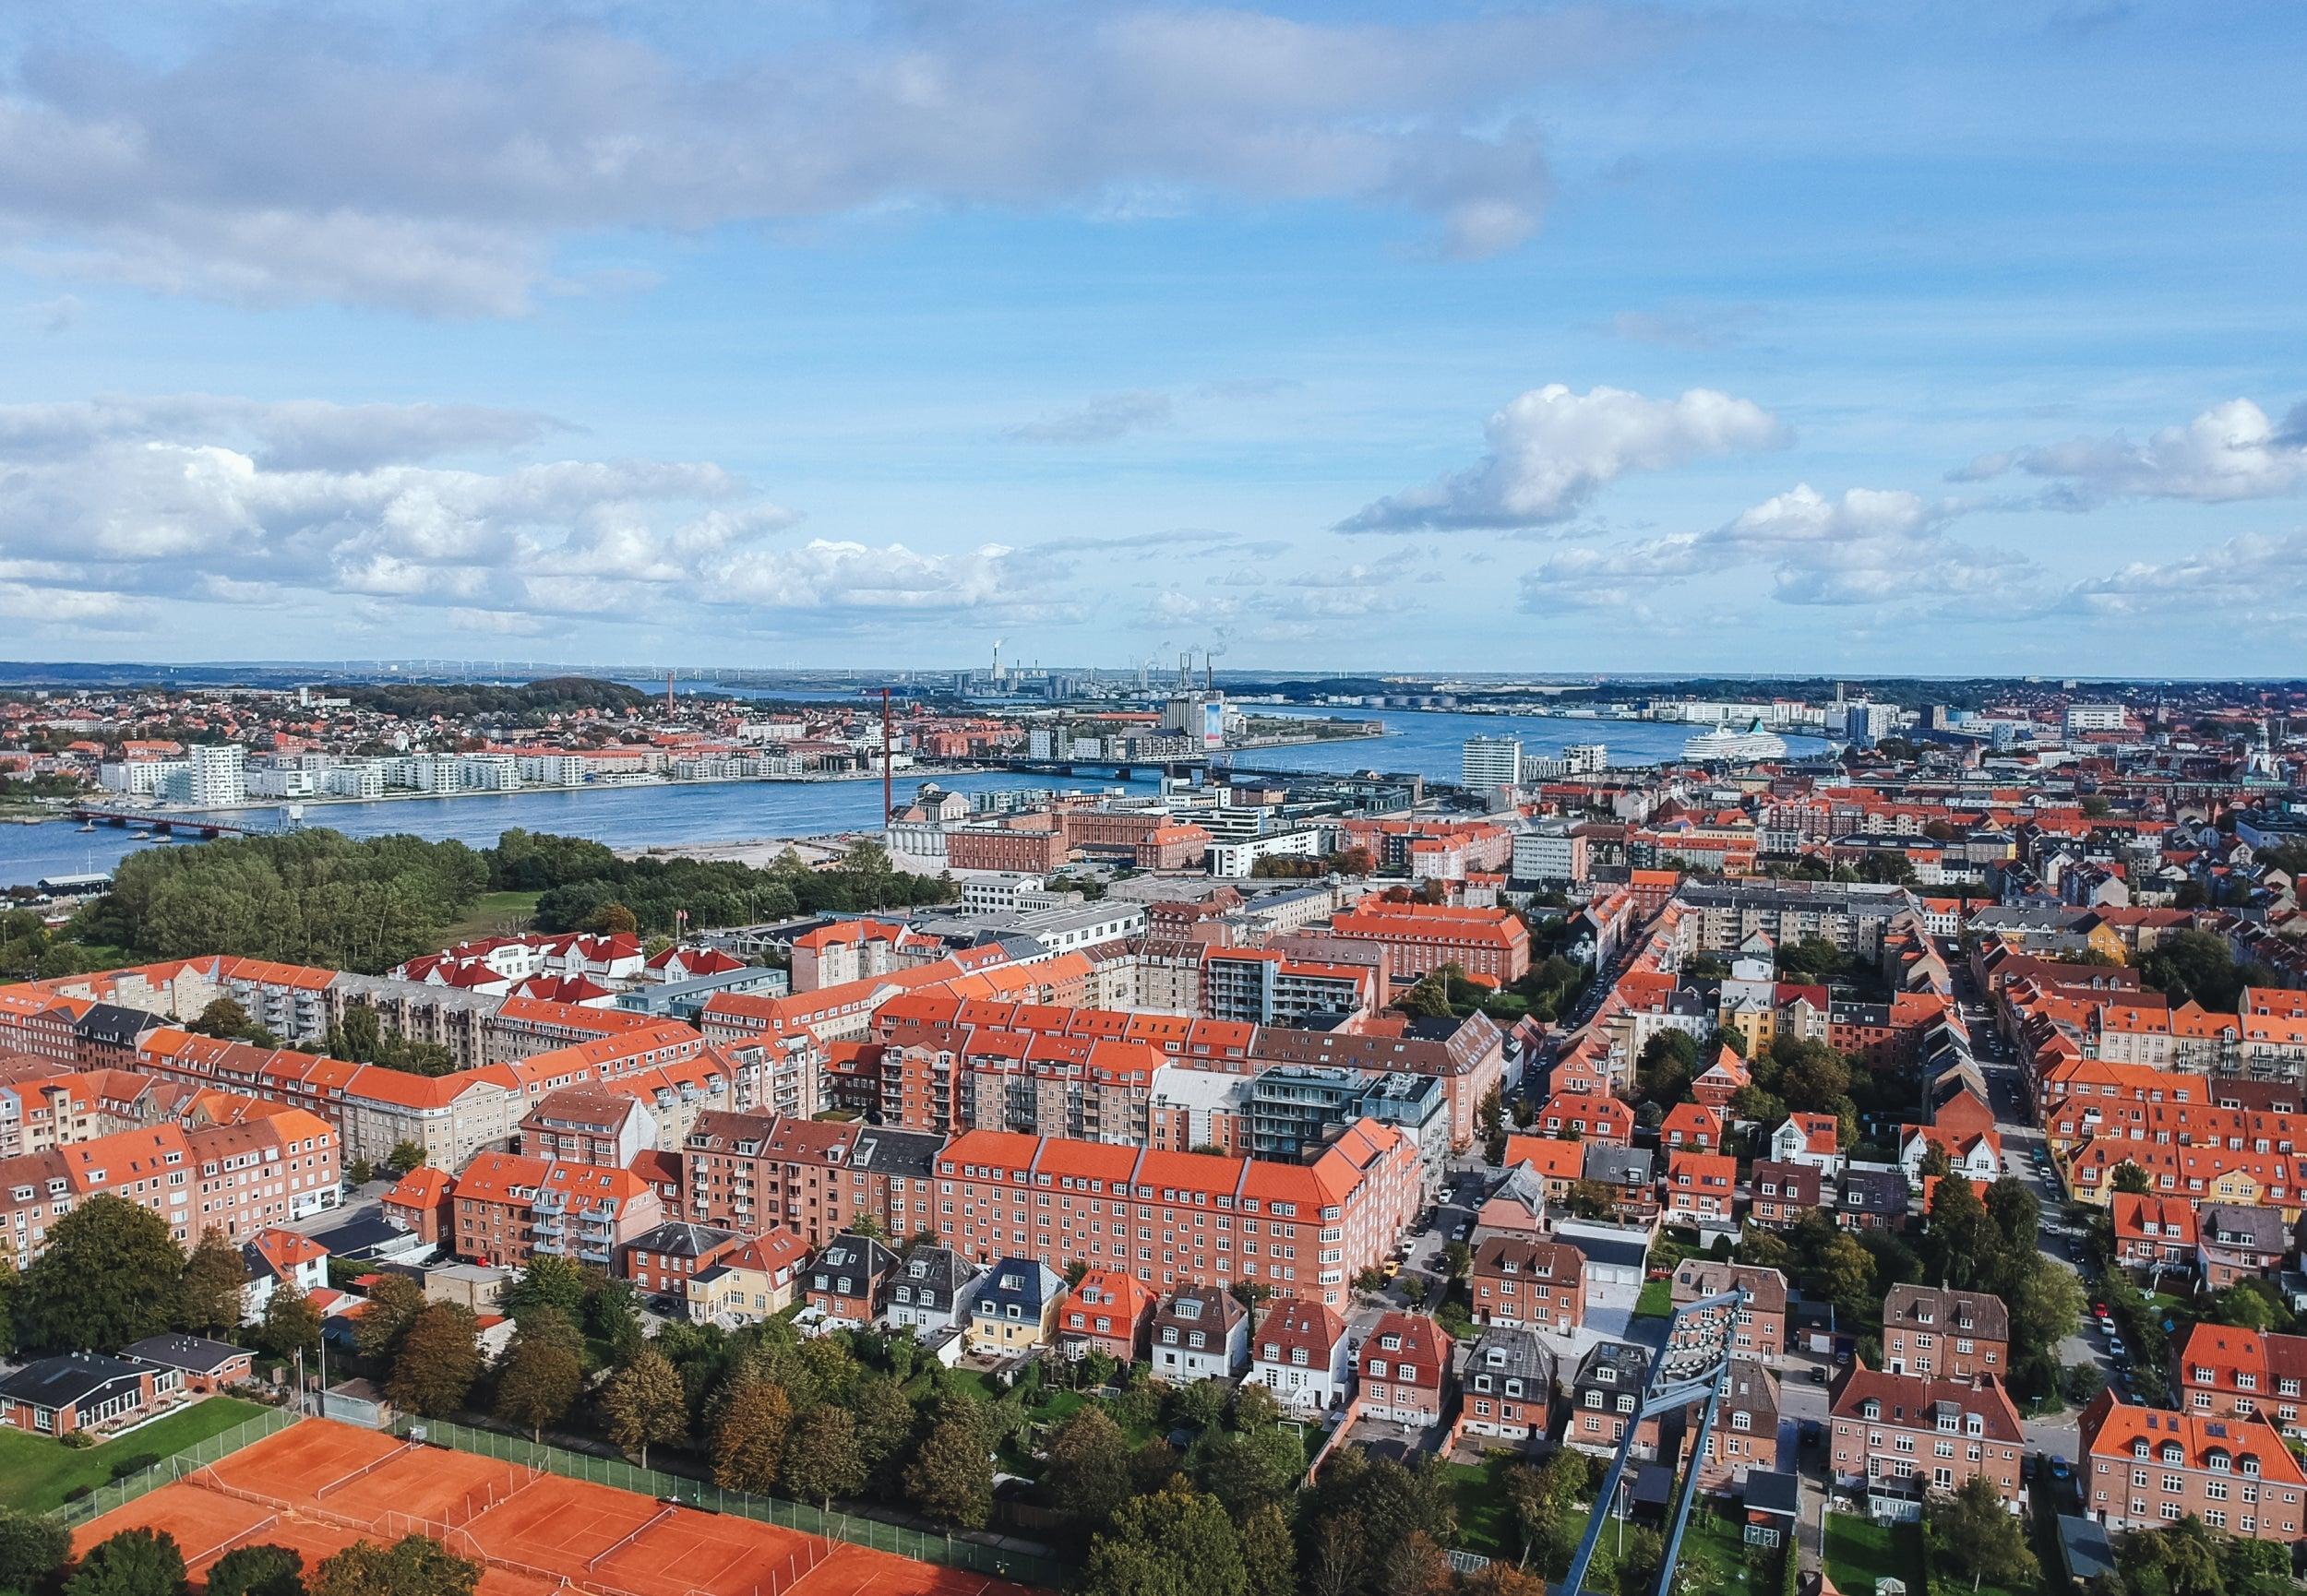 Aalborg, Denmark: Architecture revitalises the waterfront